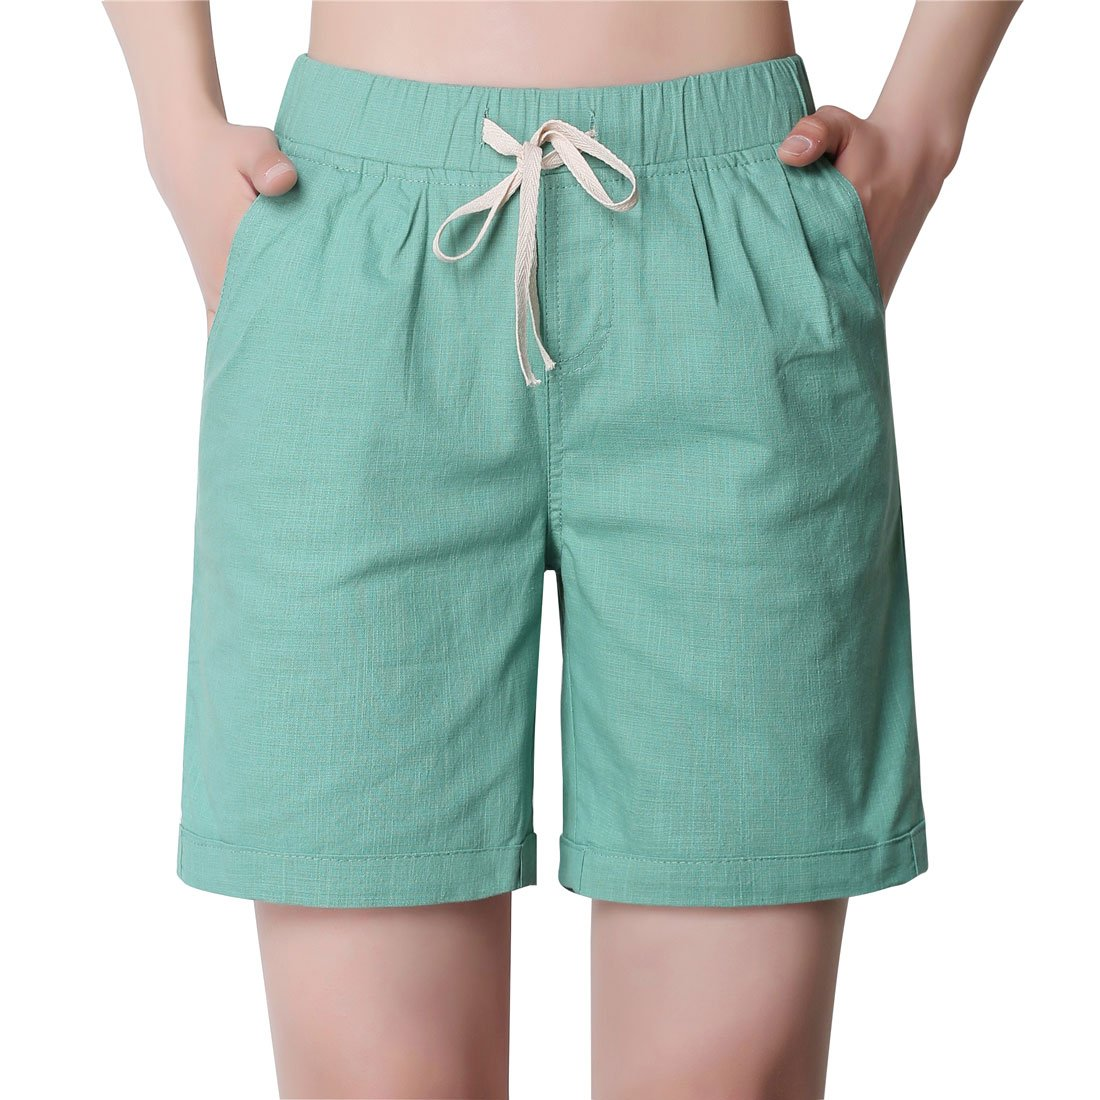 Chartou Women's Modest Loose Elastic-Waisted Bermuda Drawstring Casual Shorts (X-Large, Pea Green)